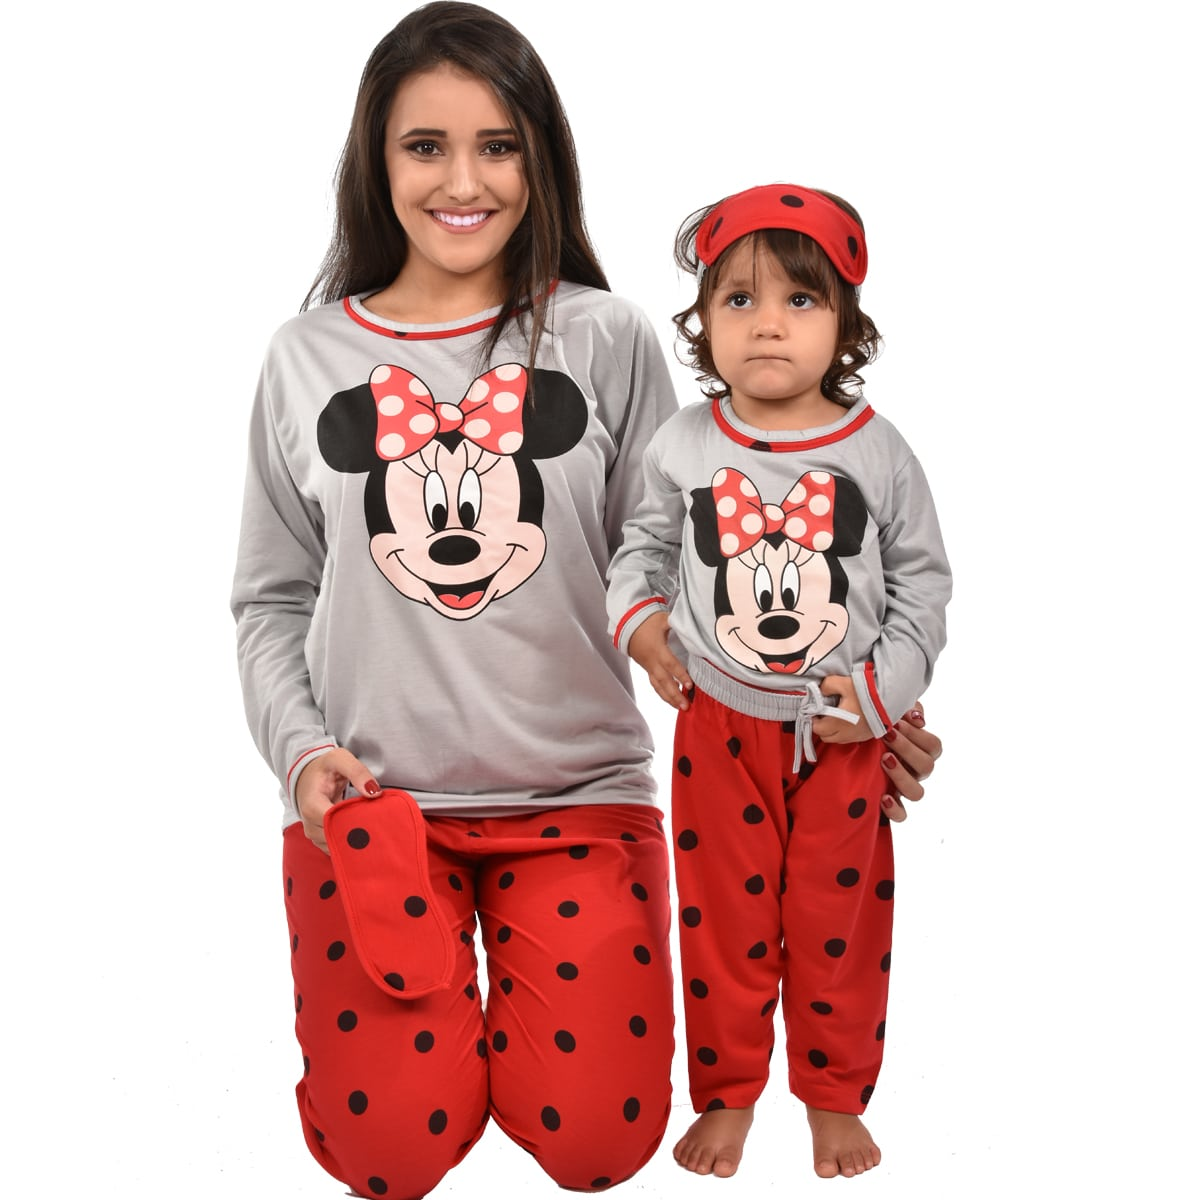 Pijama Longo Calça C/ Tapa Olho Feminino Infantil Estampa Minnie Disney Ref: 311